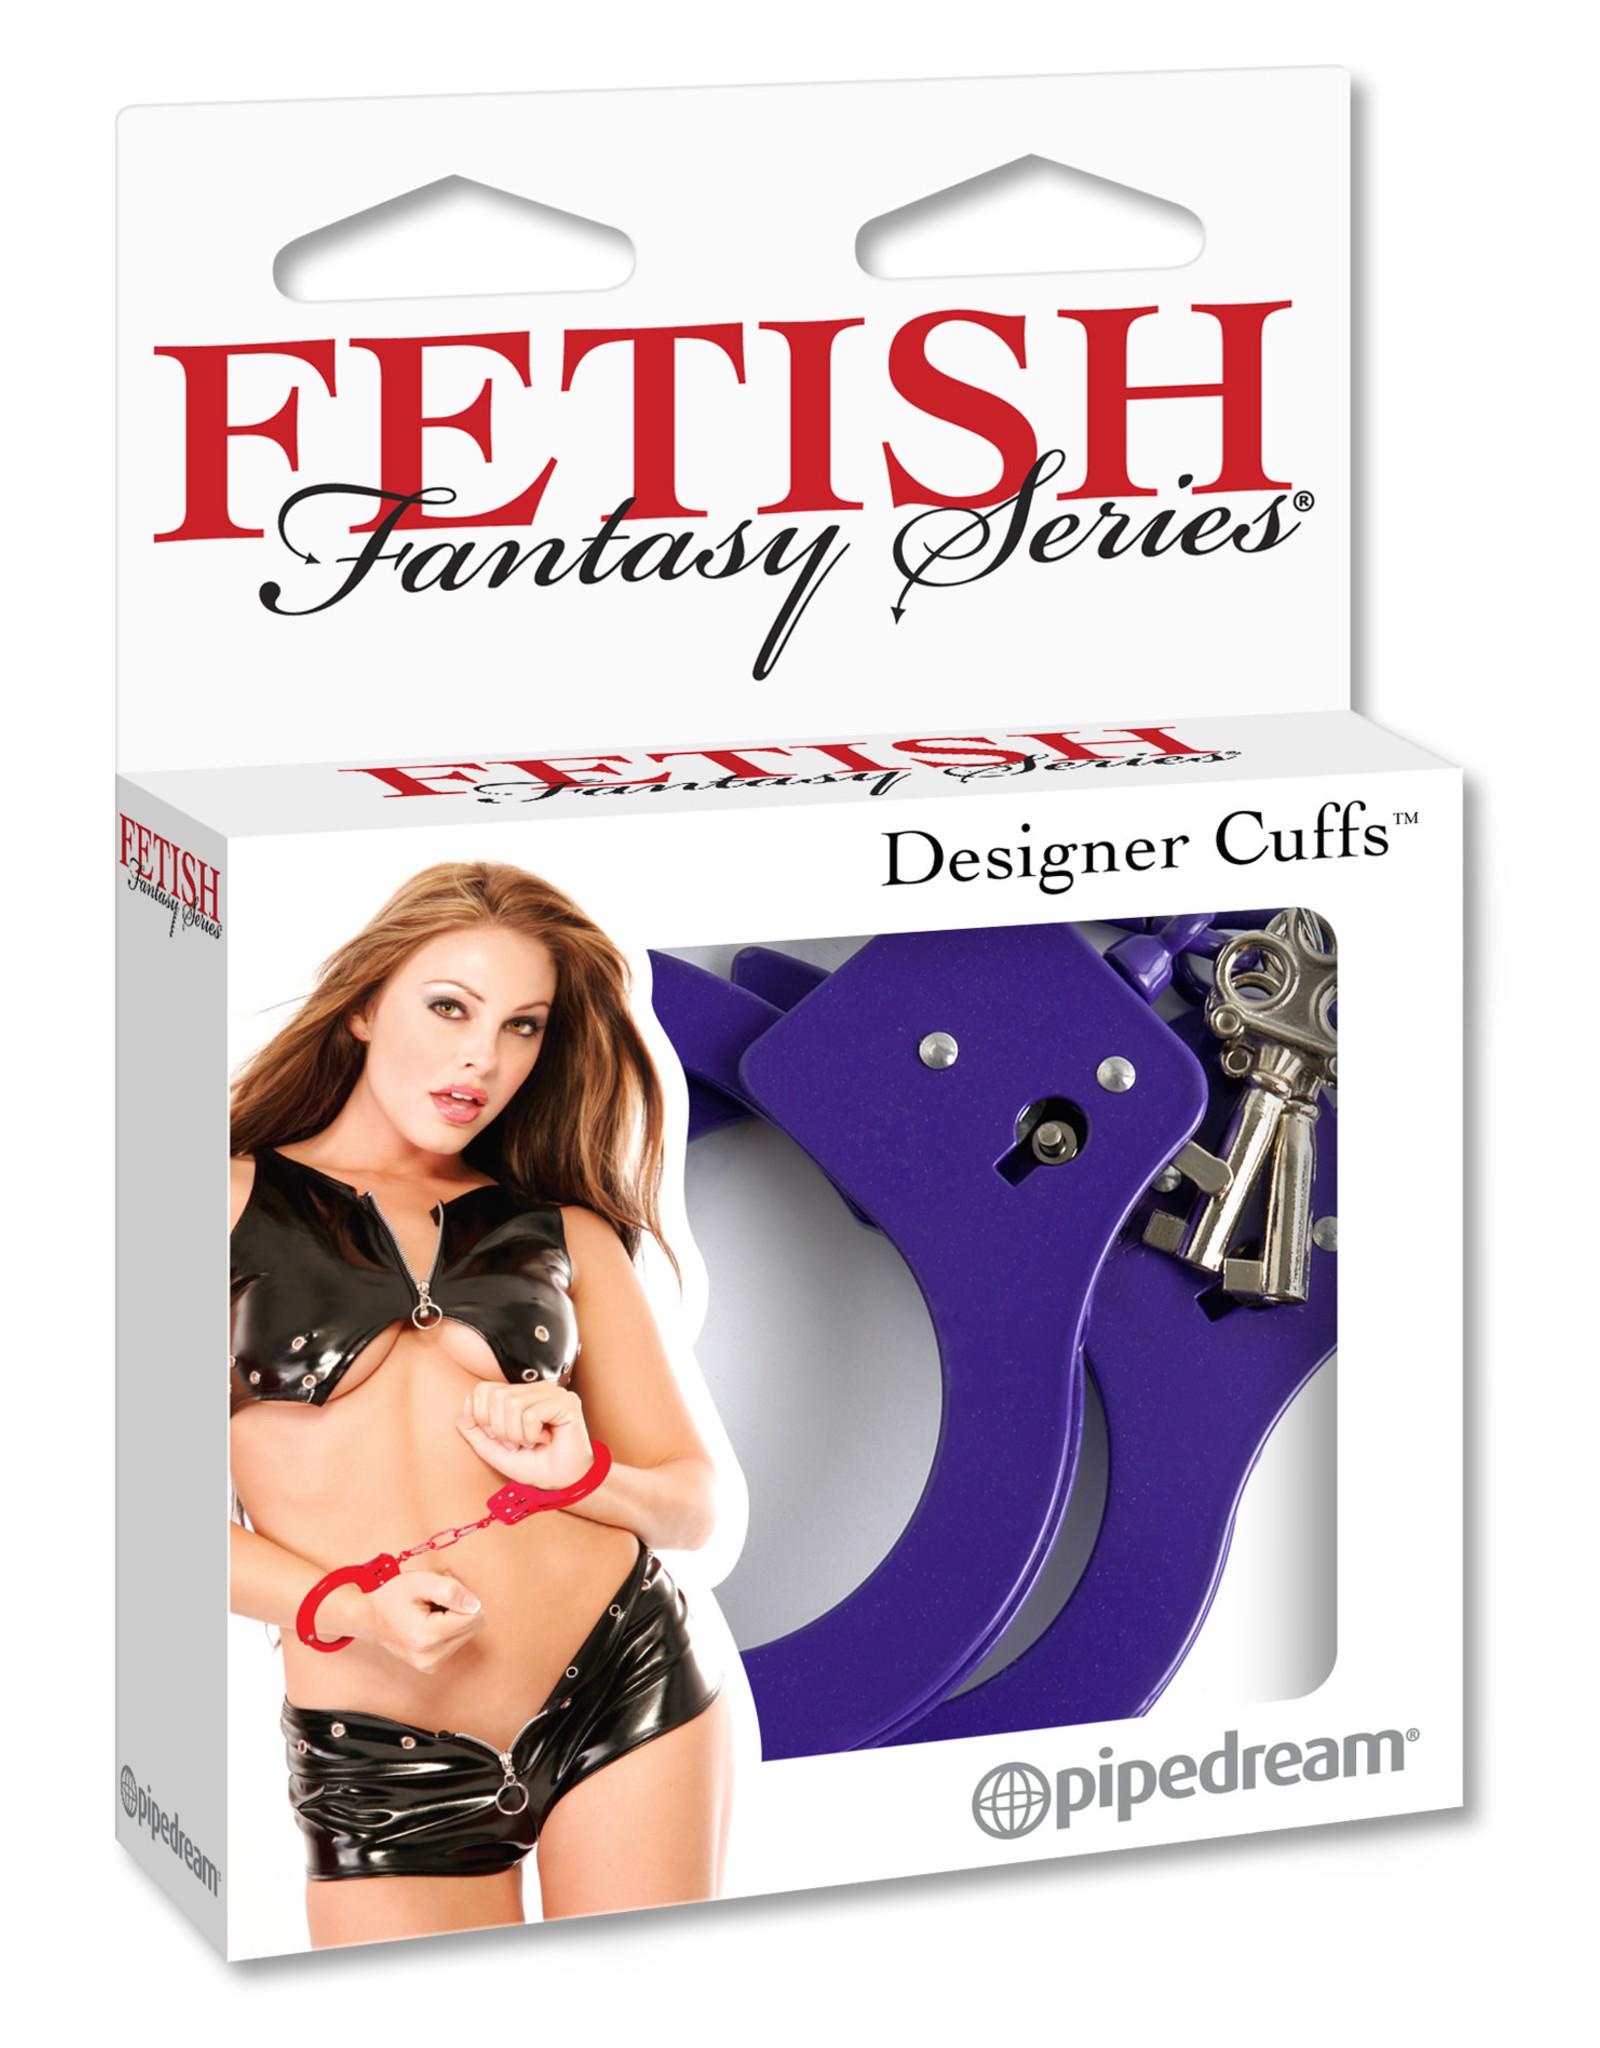 FETISH FANTASY FETISH FANTASY - DESIGNER CUFFS - PURPLE